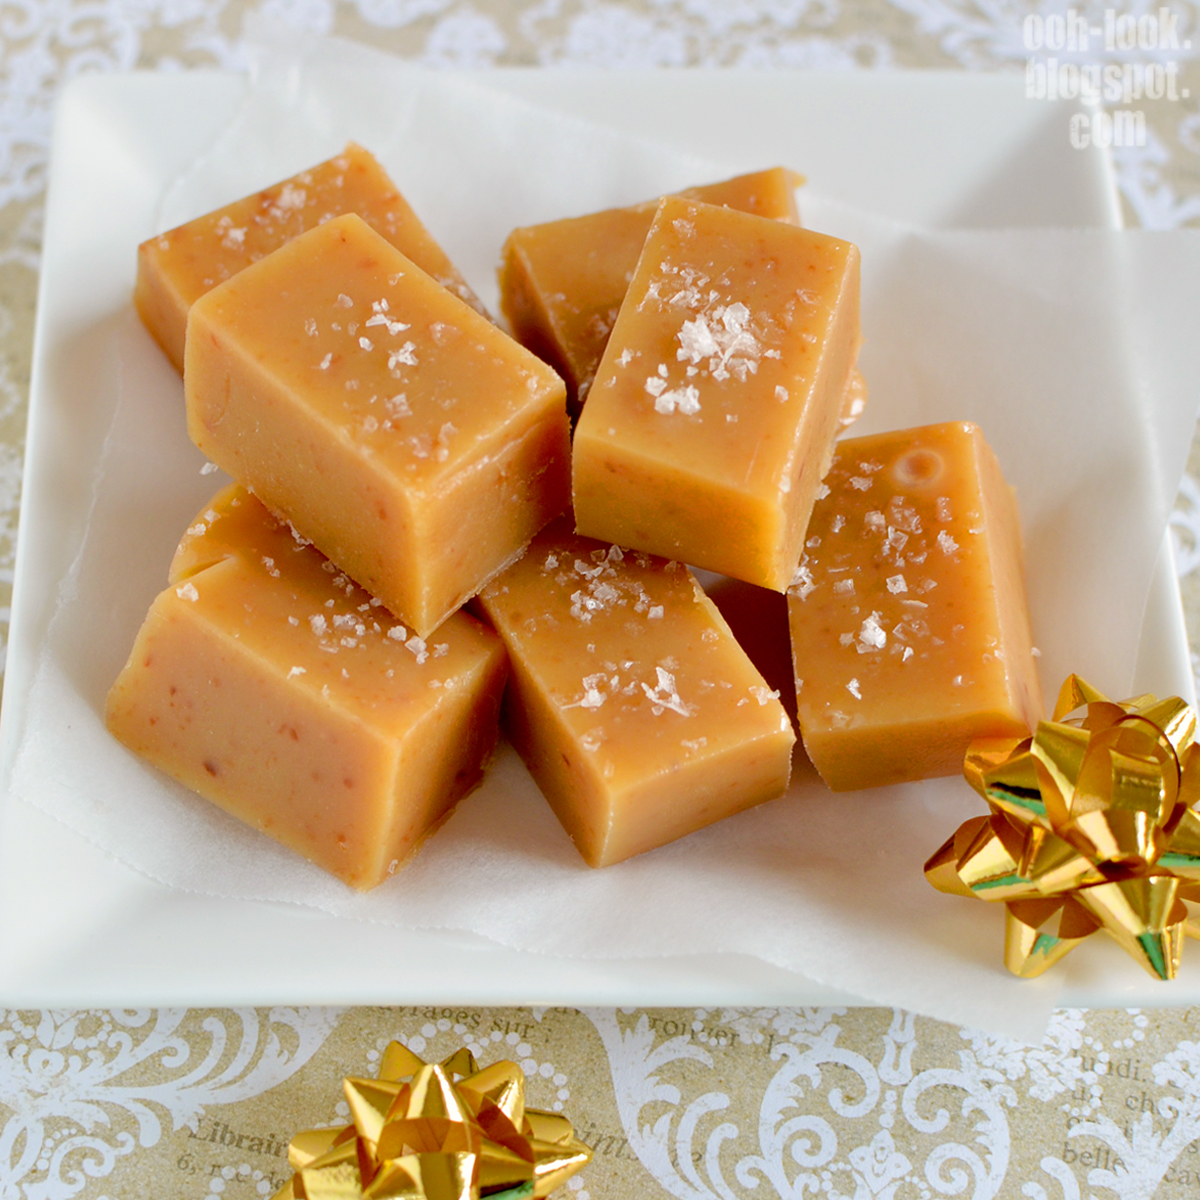 Salted Caramel Fudge Or Sugar Sugar